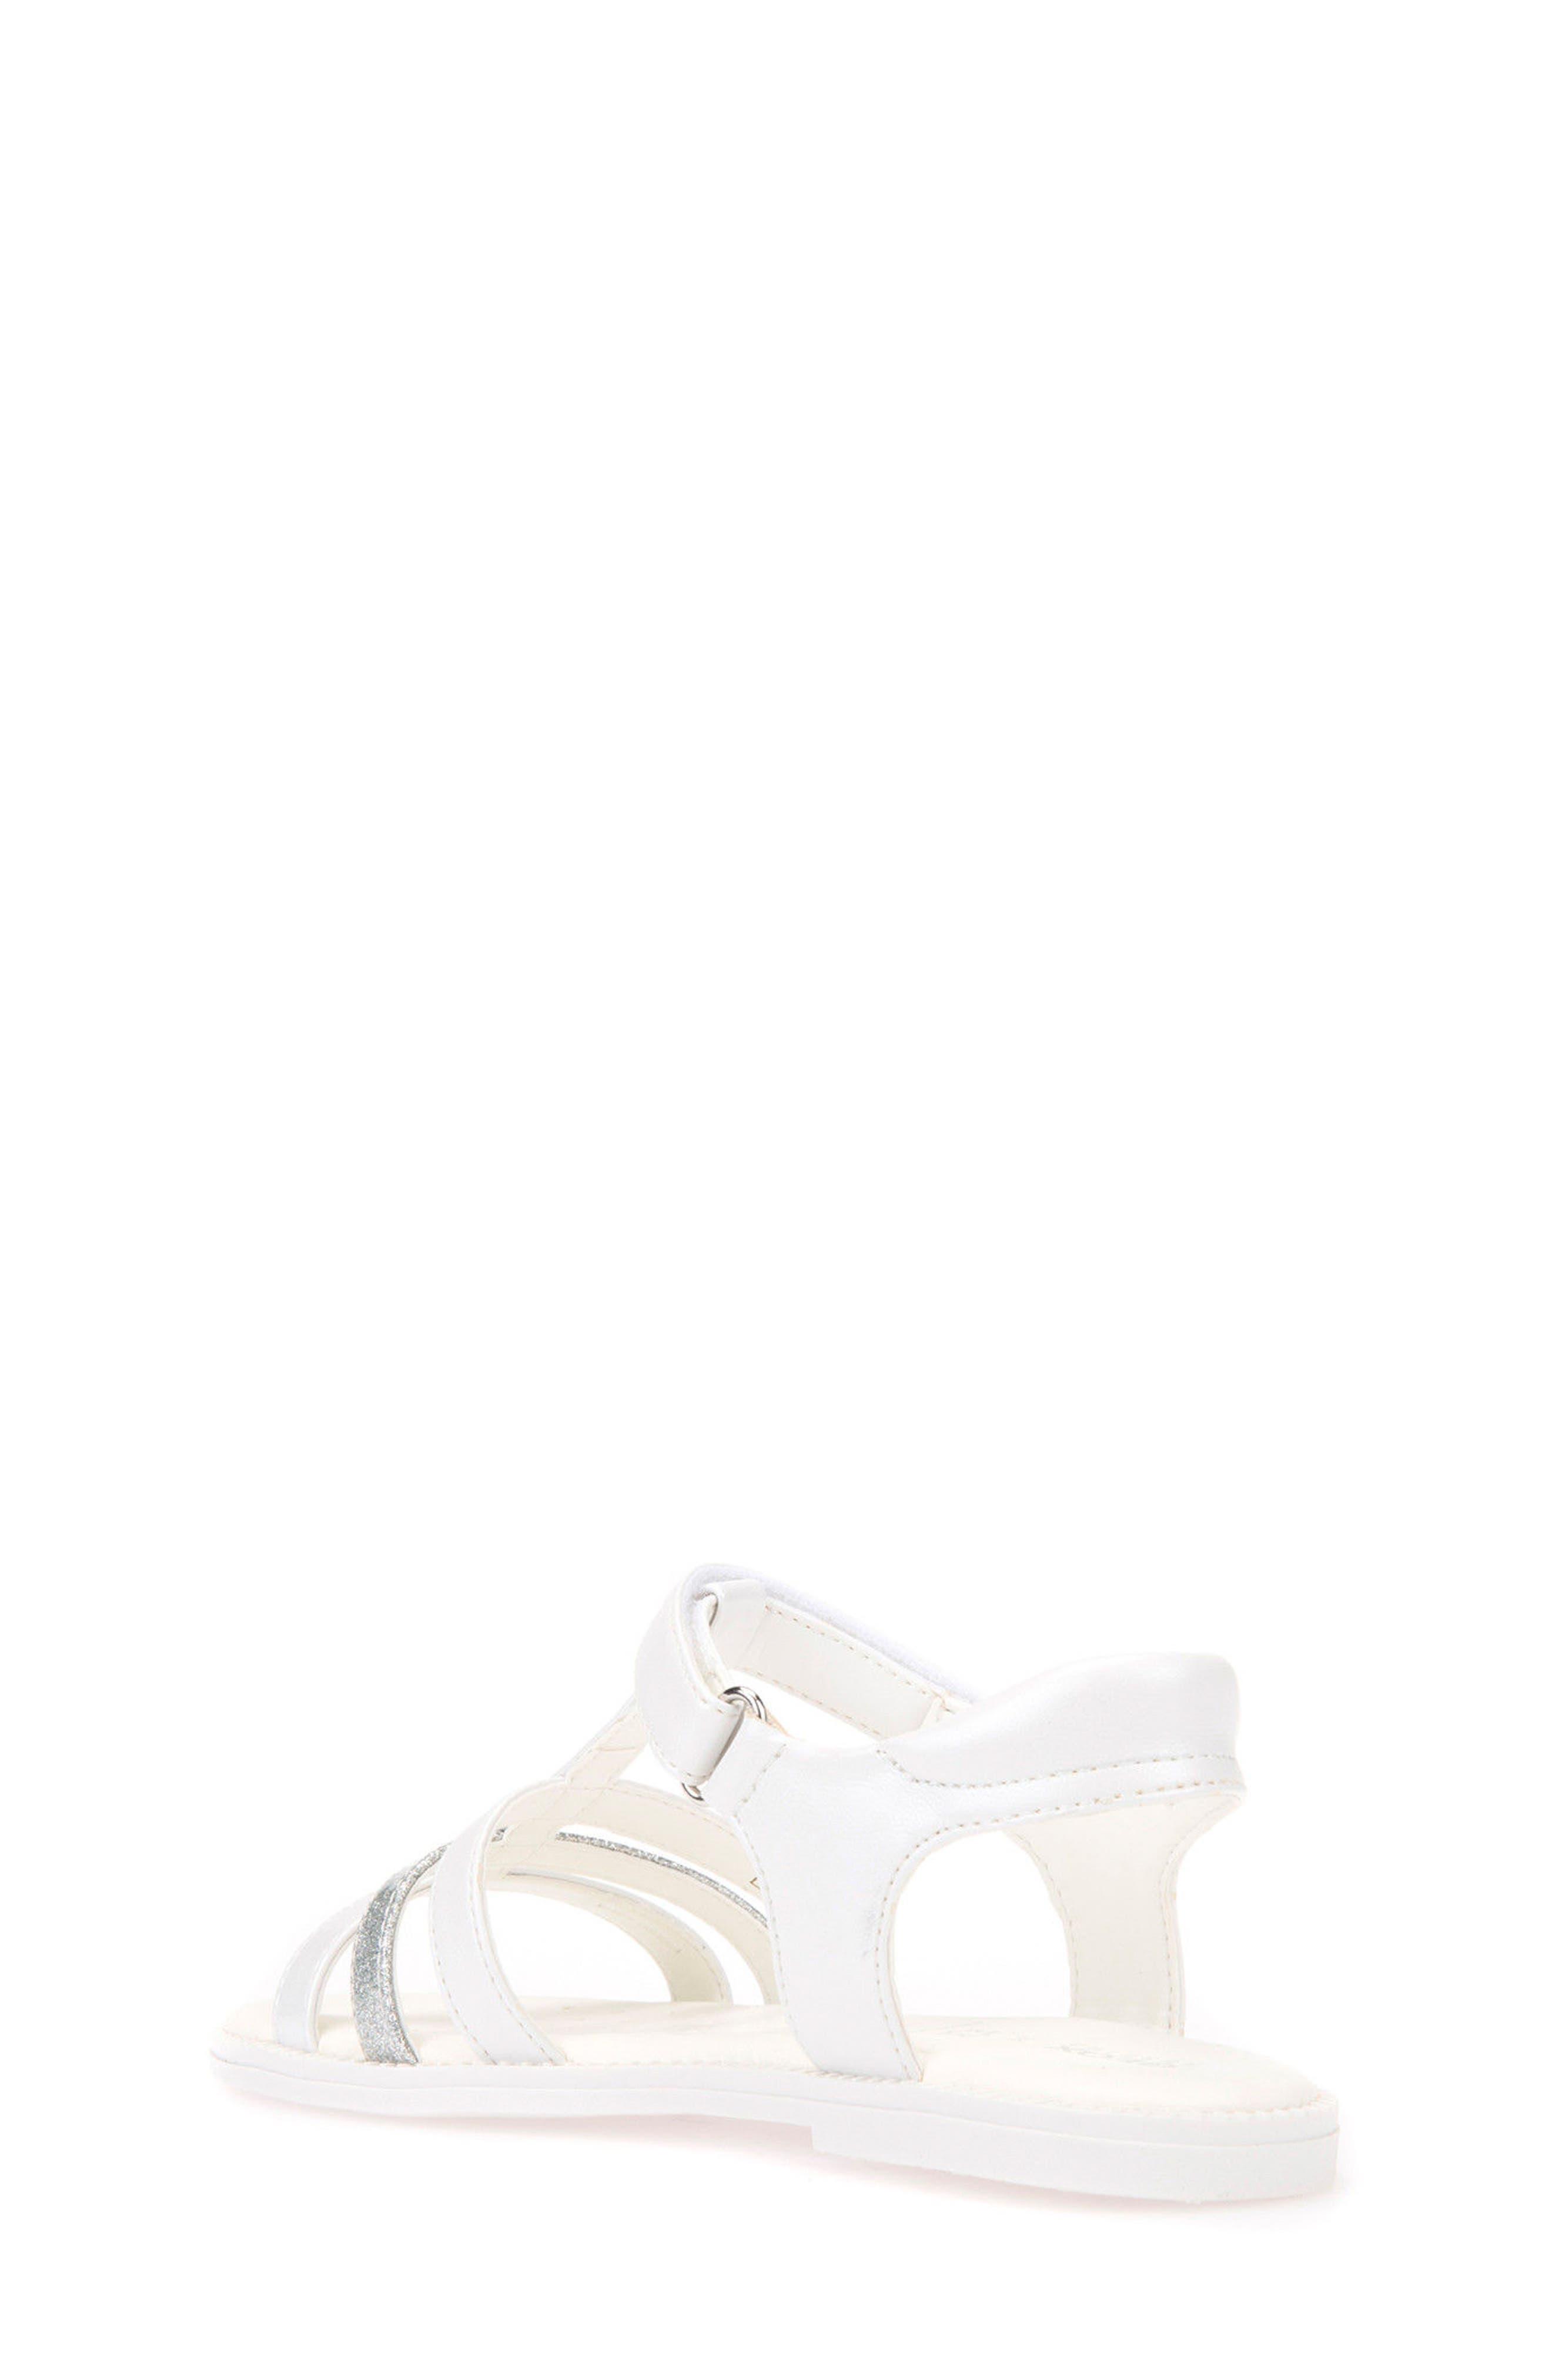 Karly Water Friendly Sandal,                             Alternate thumbnail 2, color,                             WHITE